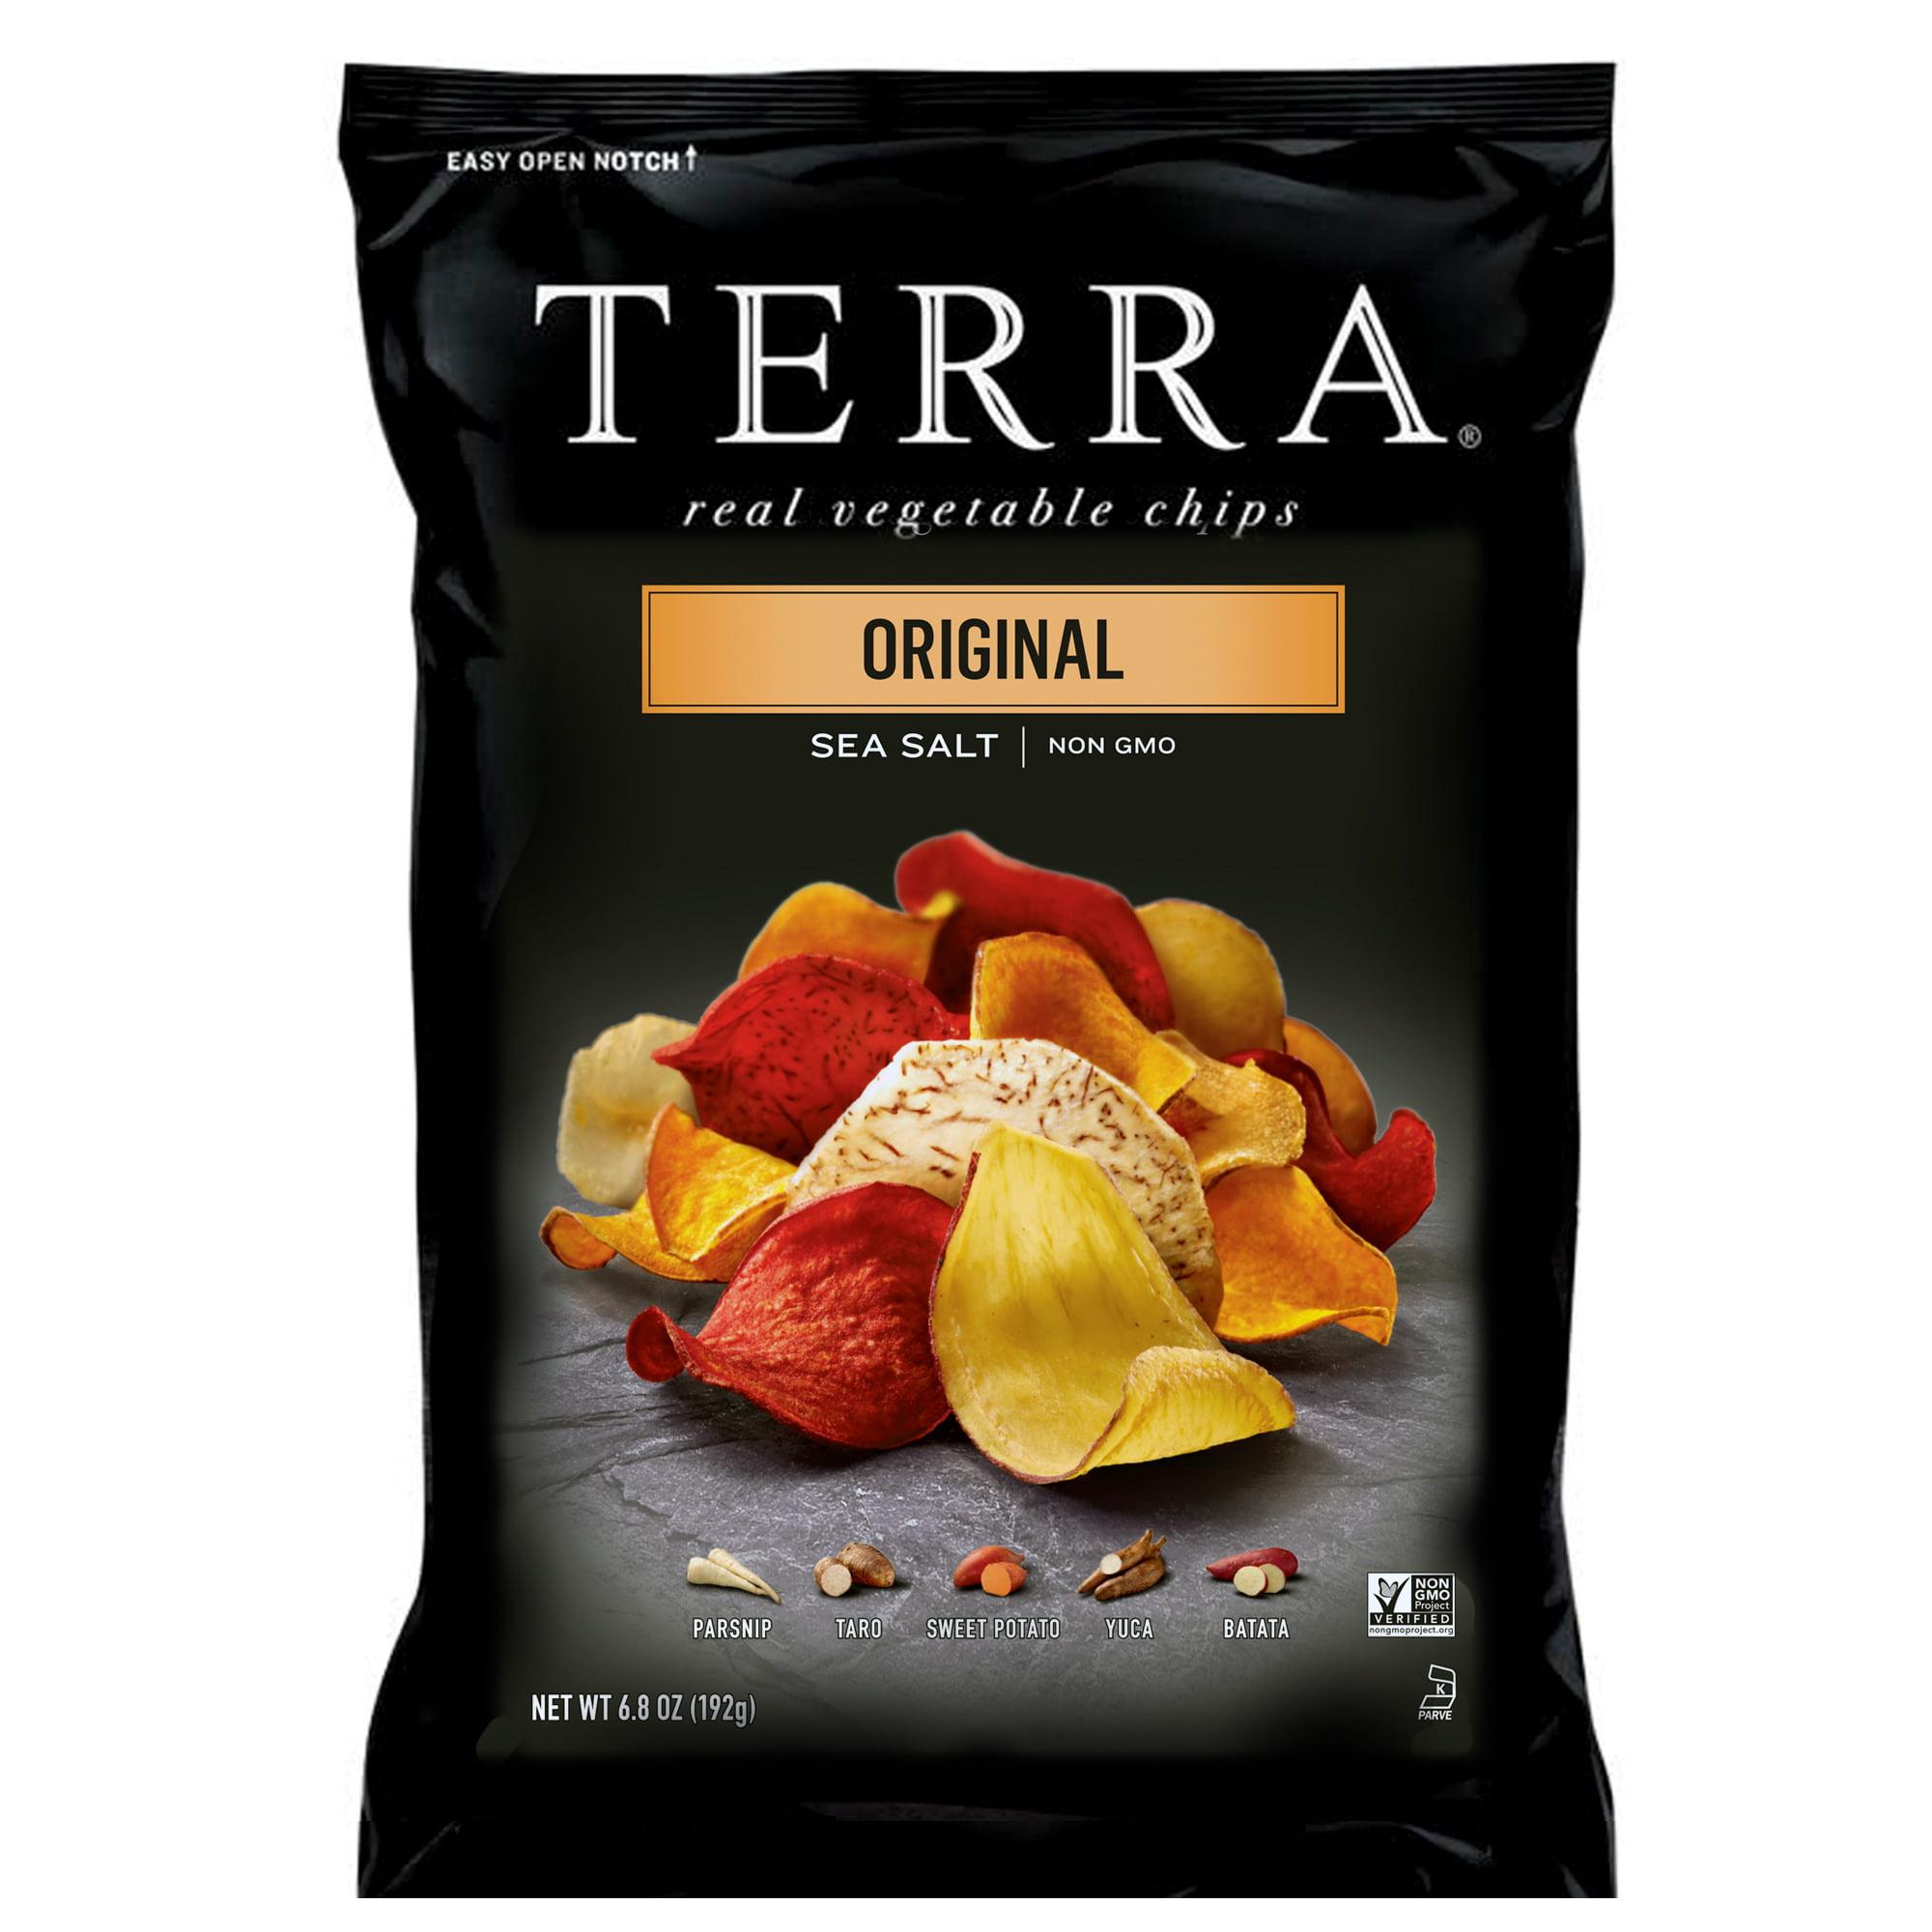 (2 pack) TERRA Original Chips with Sea Salt, 6.8 oz.